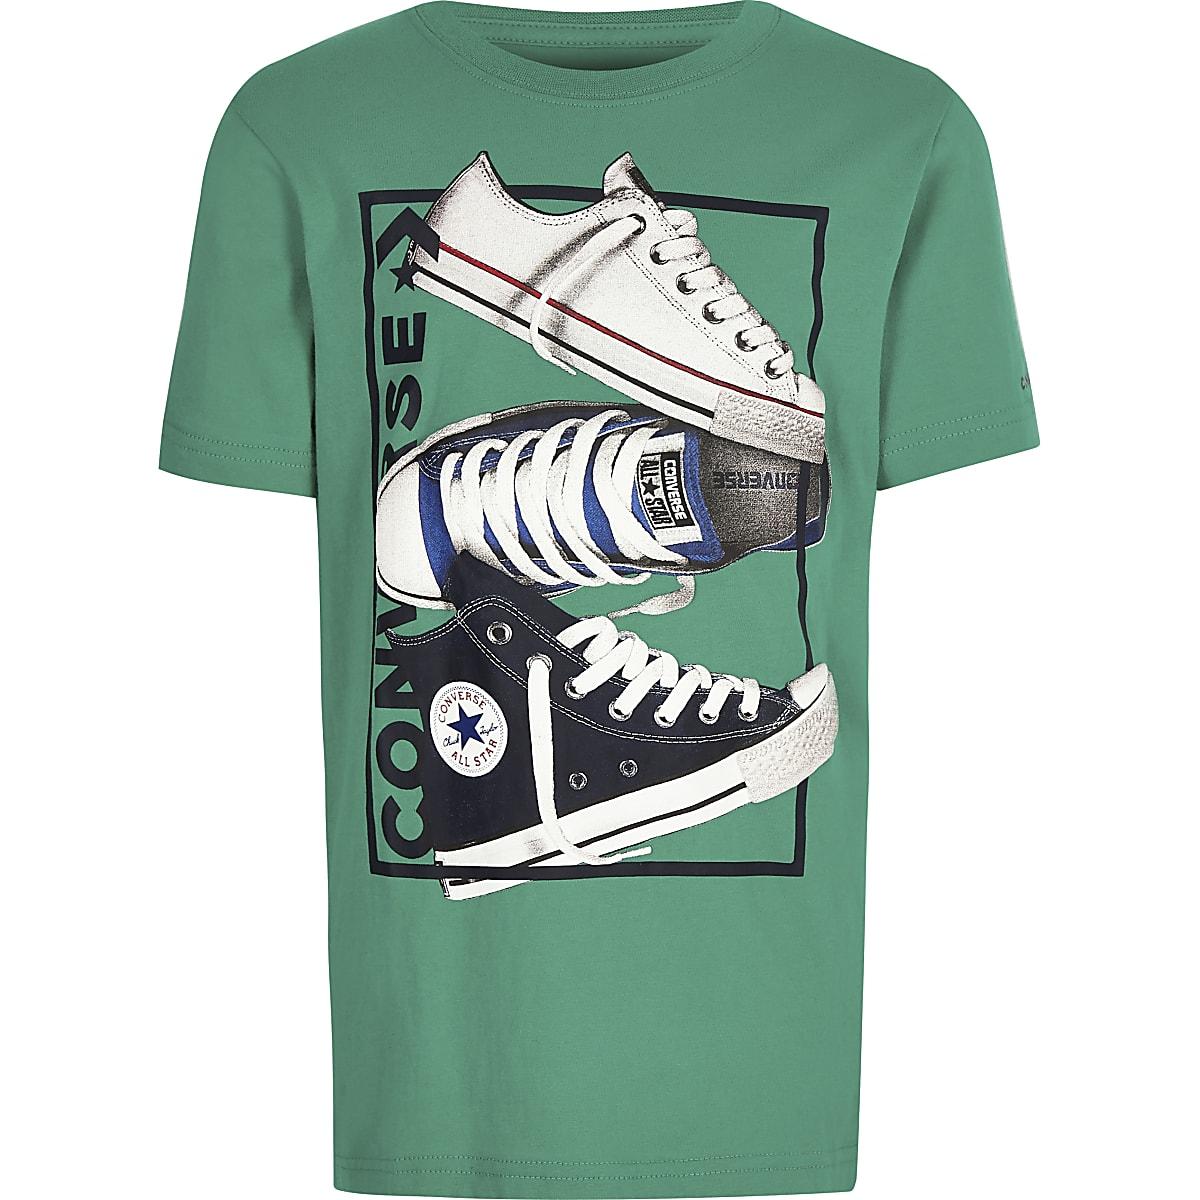 Boys Converse green print T-shirt